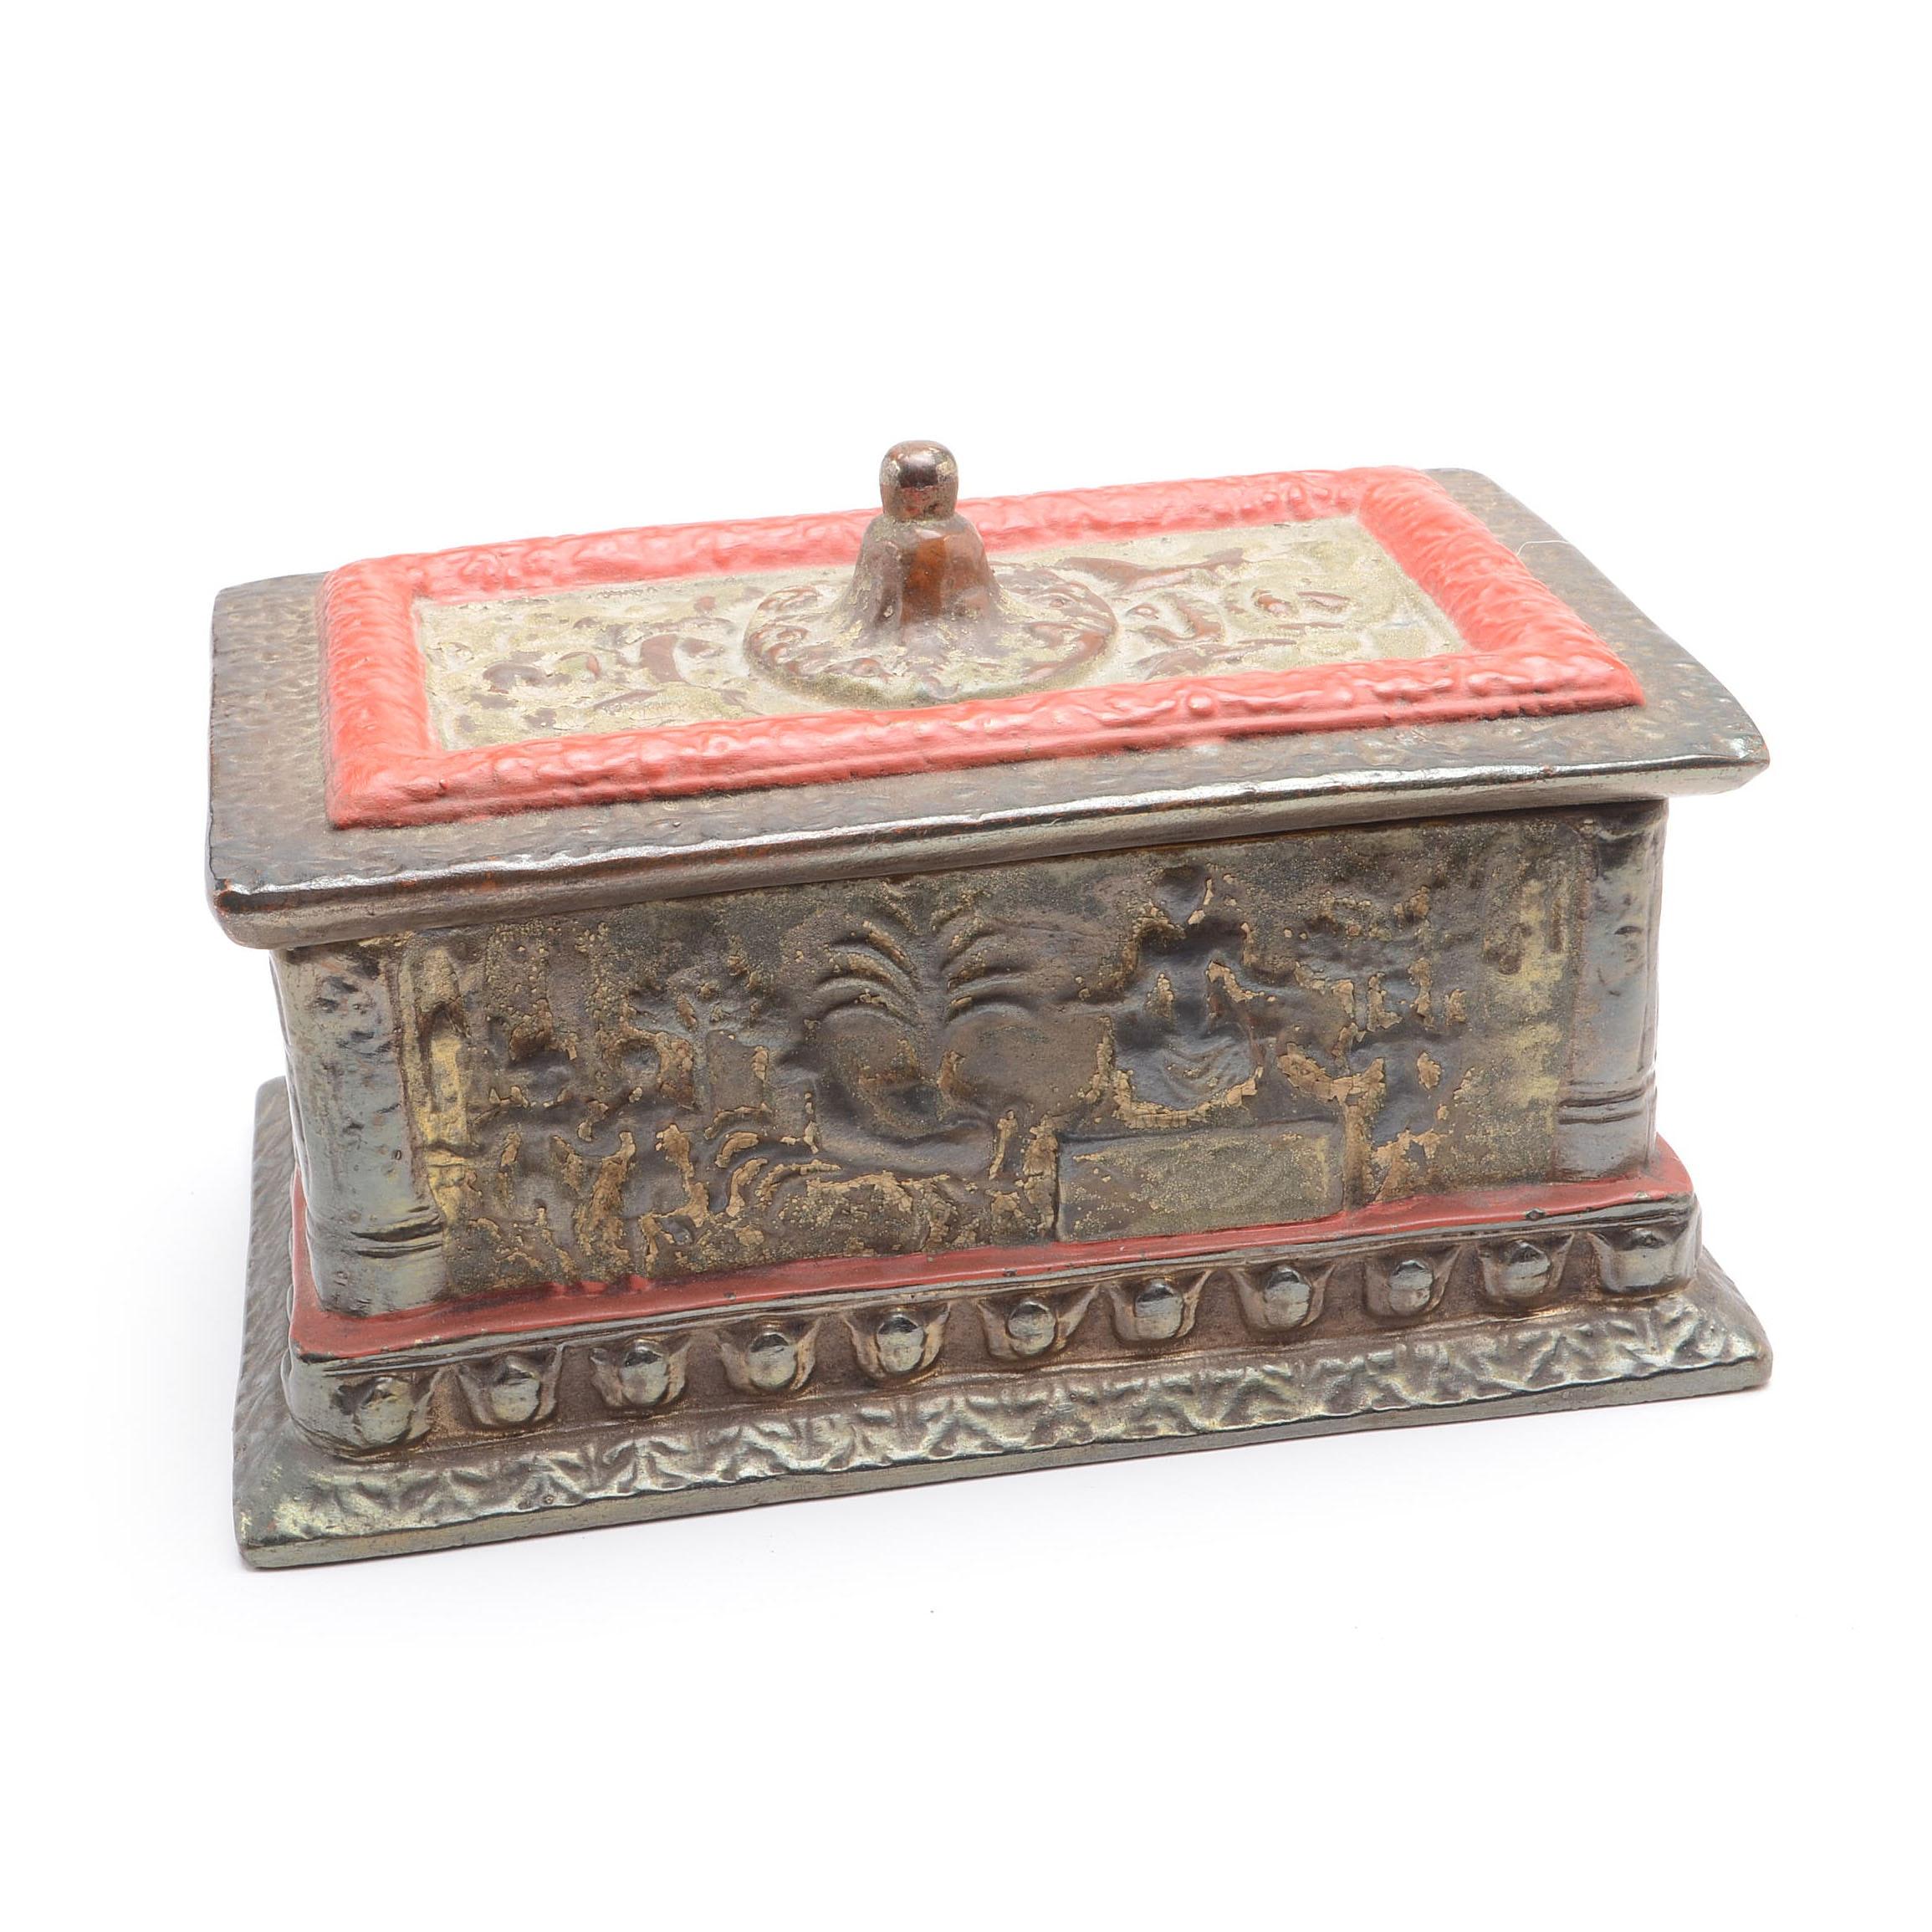 Vintage Egyptian Themed Decorative Box